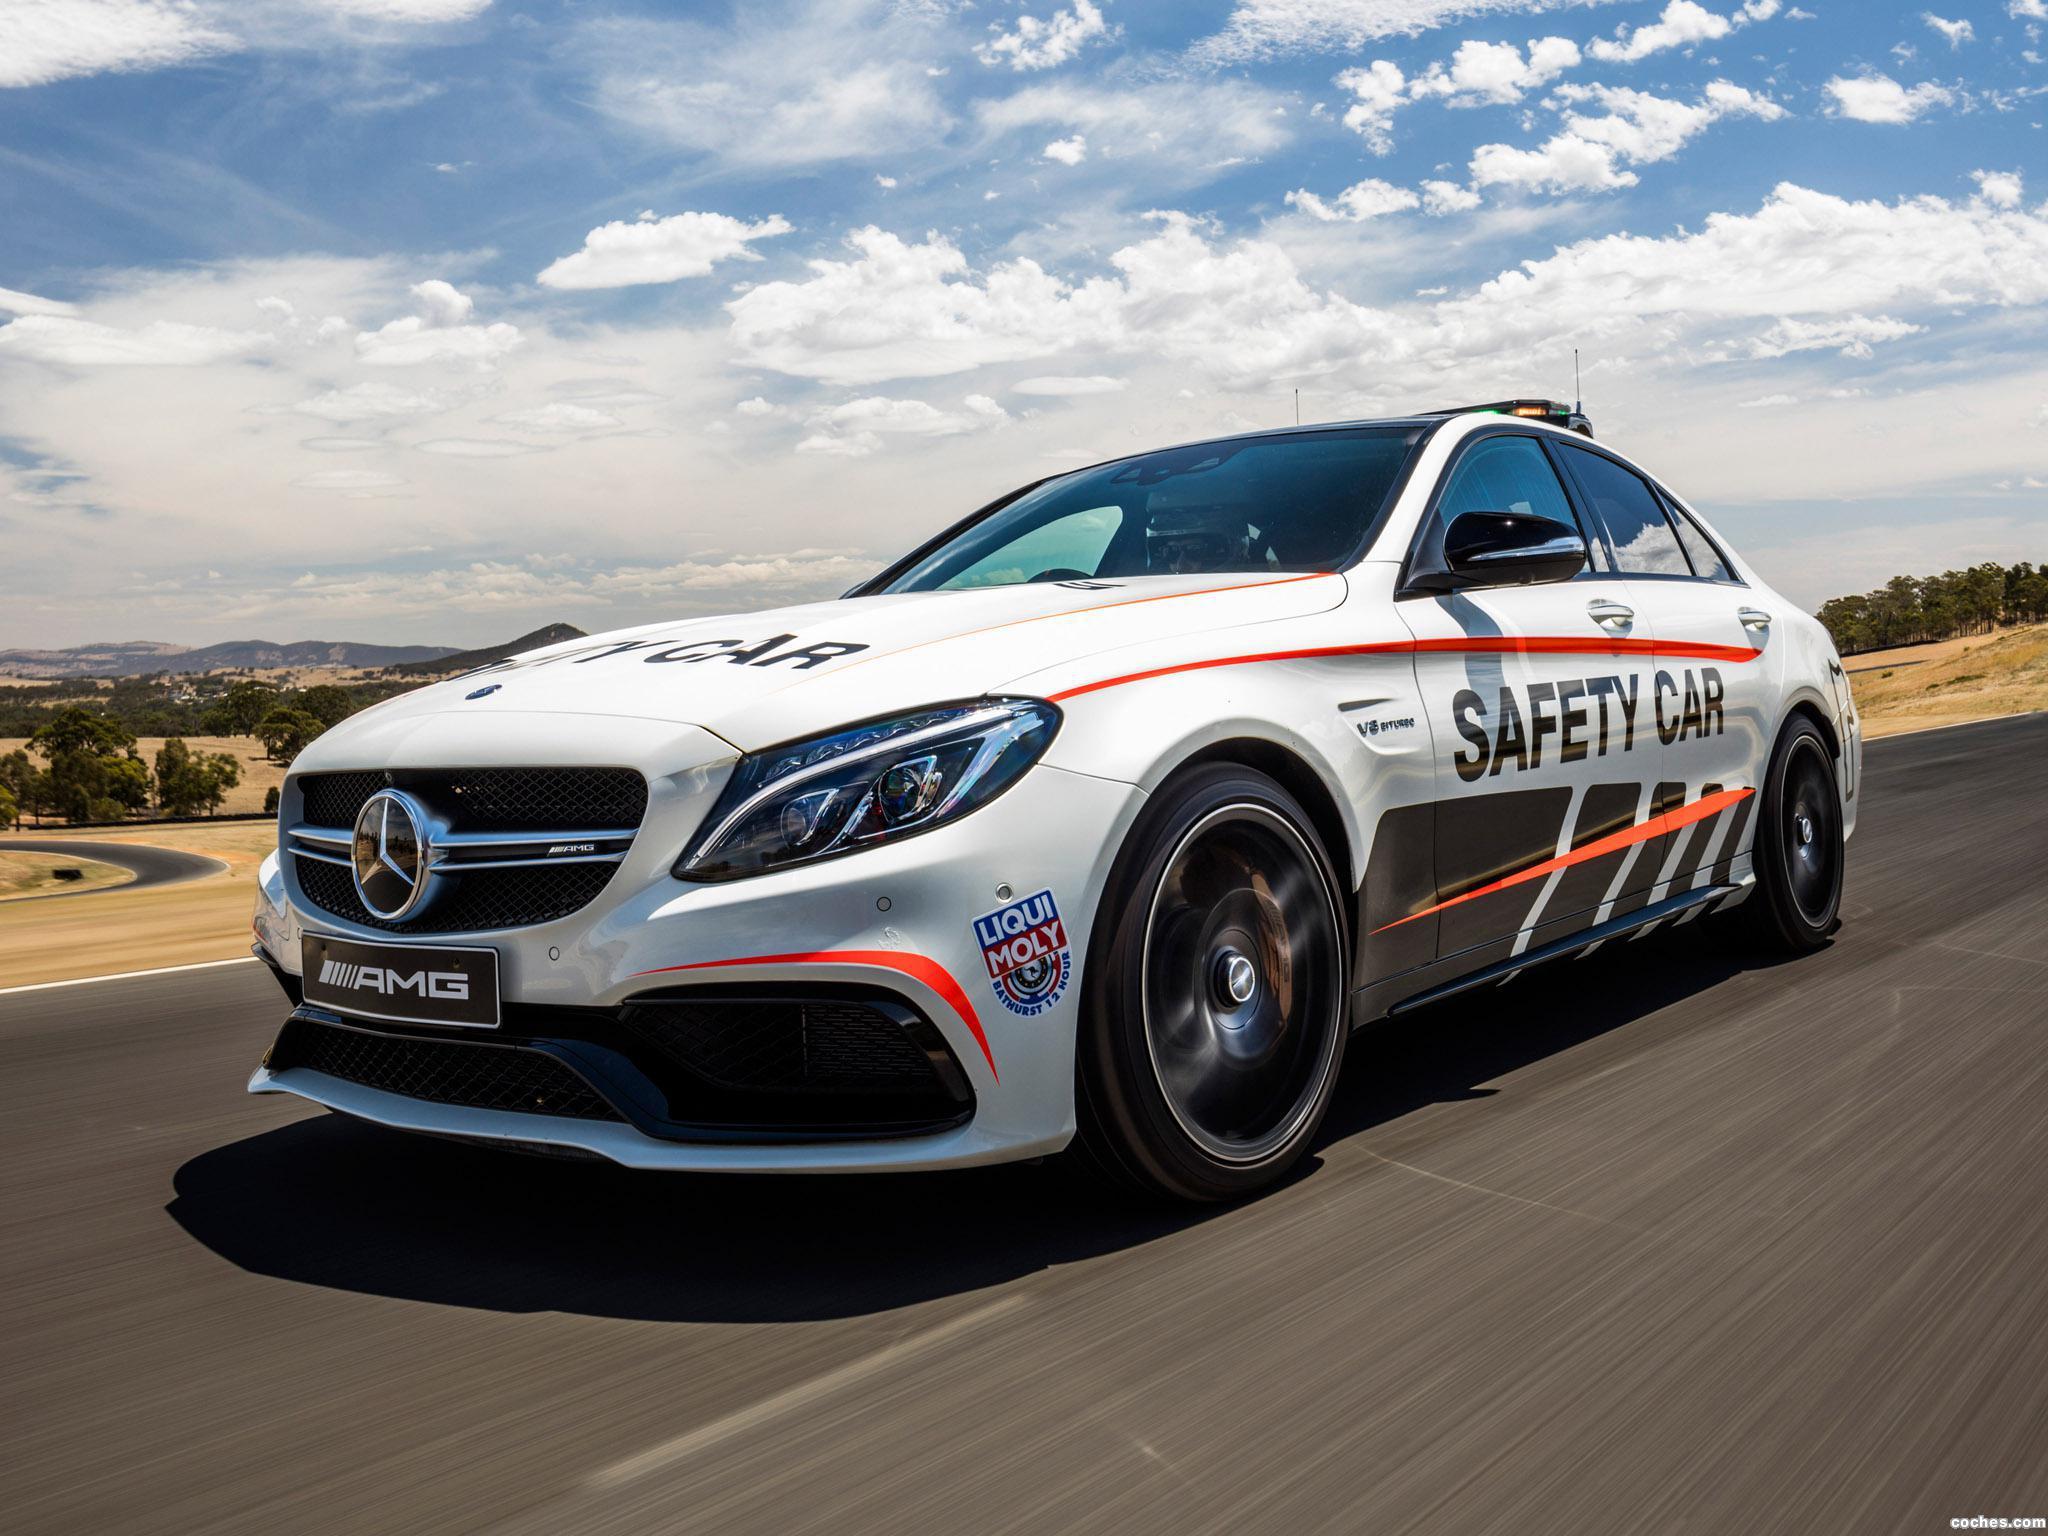 Foto 2 de Mercedes AMG C63 S Safety Car W205 2016